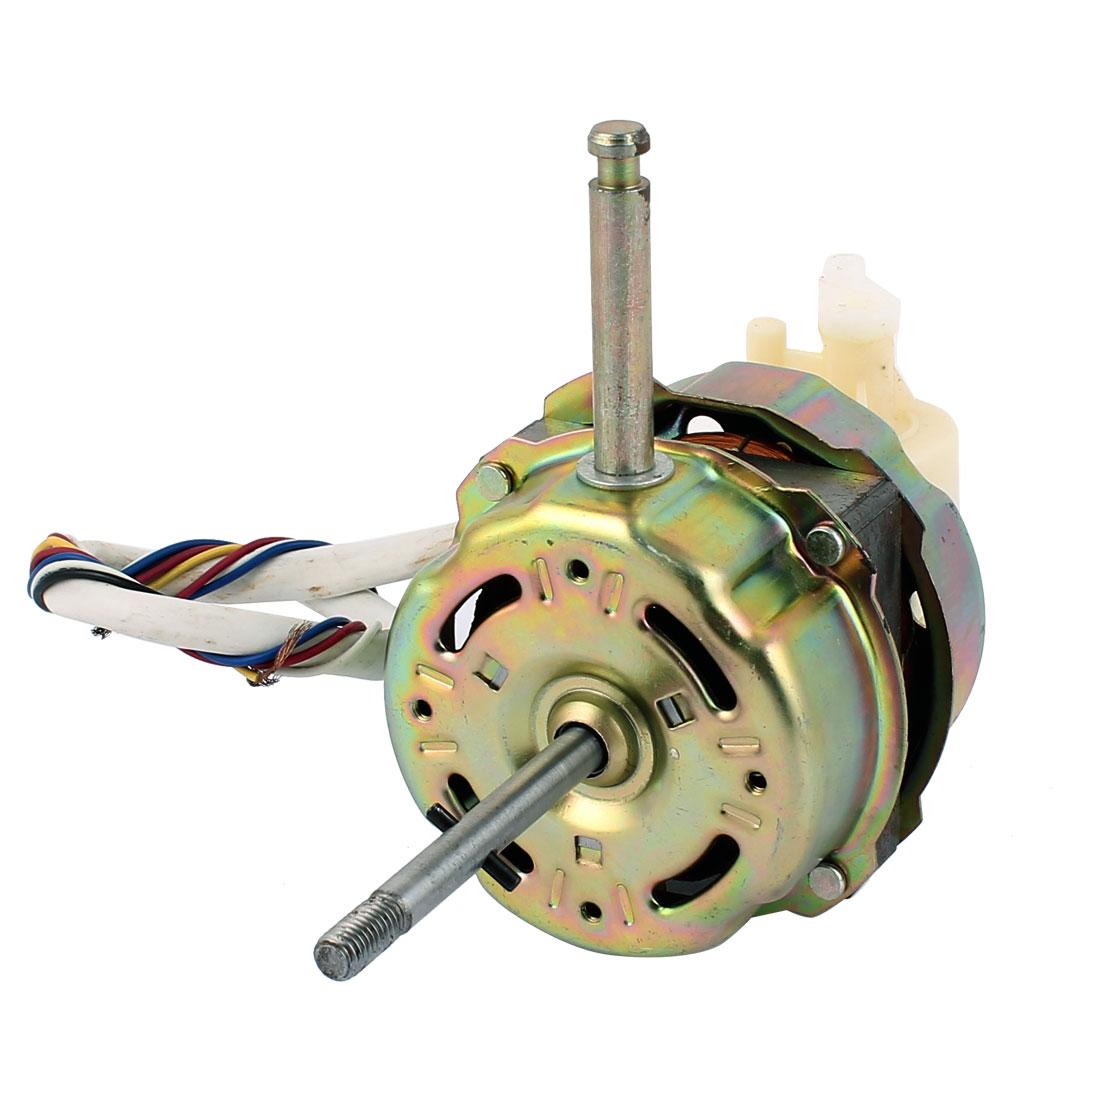 AC 220V 0.2A 10W 1200RPM 8mm x 75mm Shaft Electric Ventilator Fan Motor